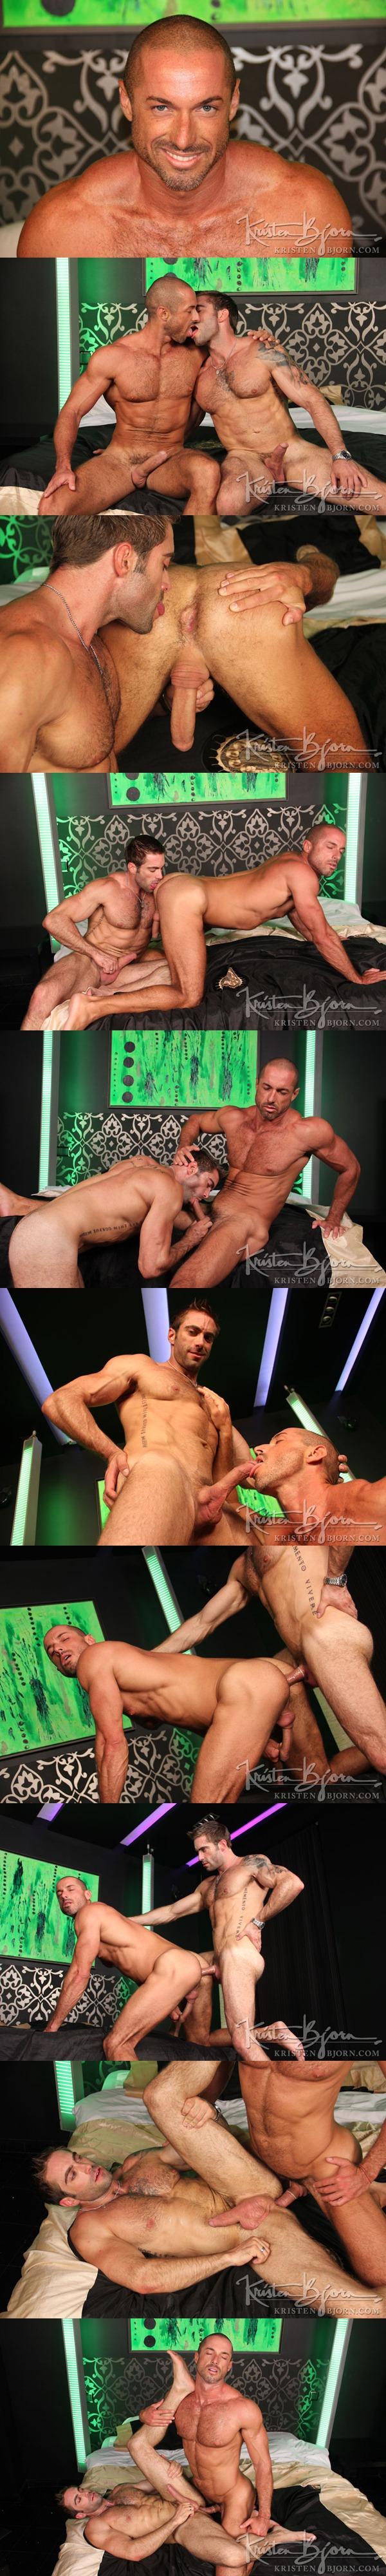 Jake Genesis & Hot Brazilian Marcelo Montero Flip-Flop in Casting Couch 287 at Kristenbjorn 01